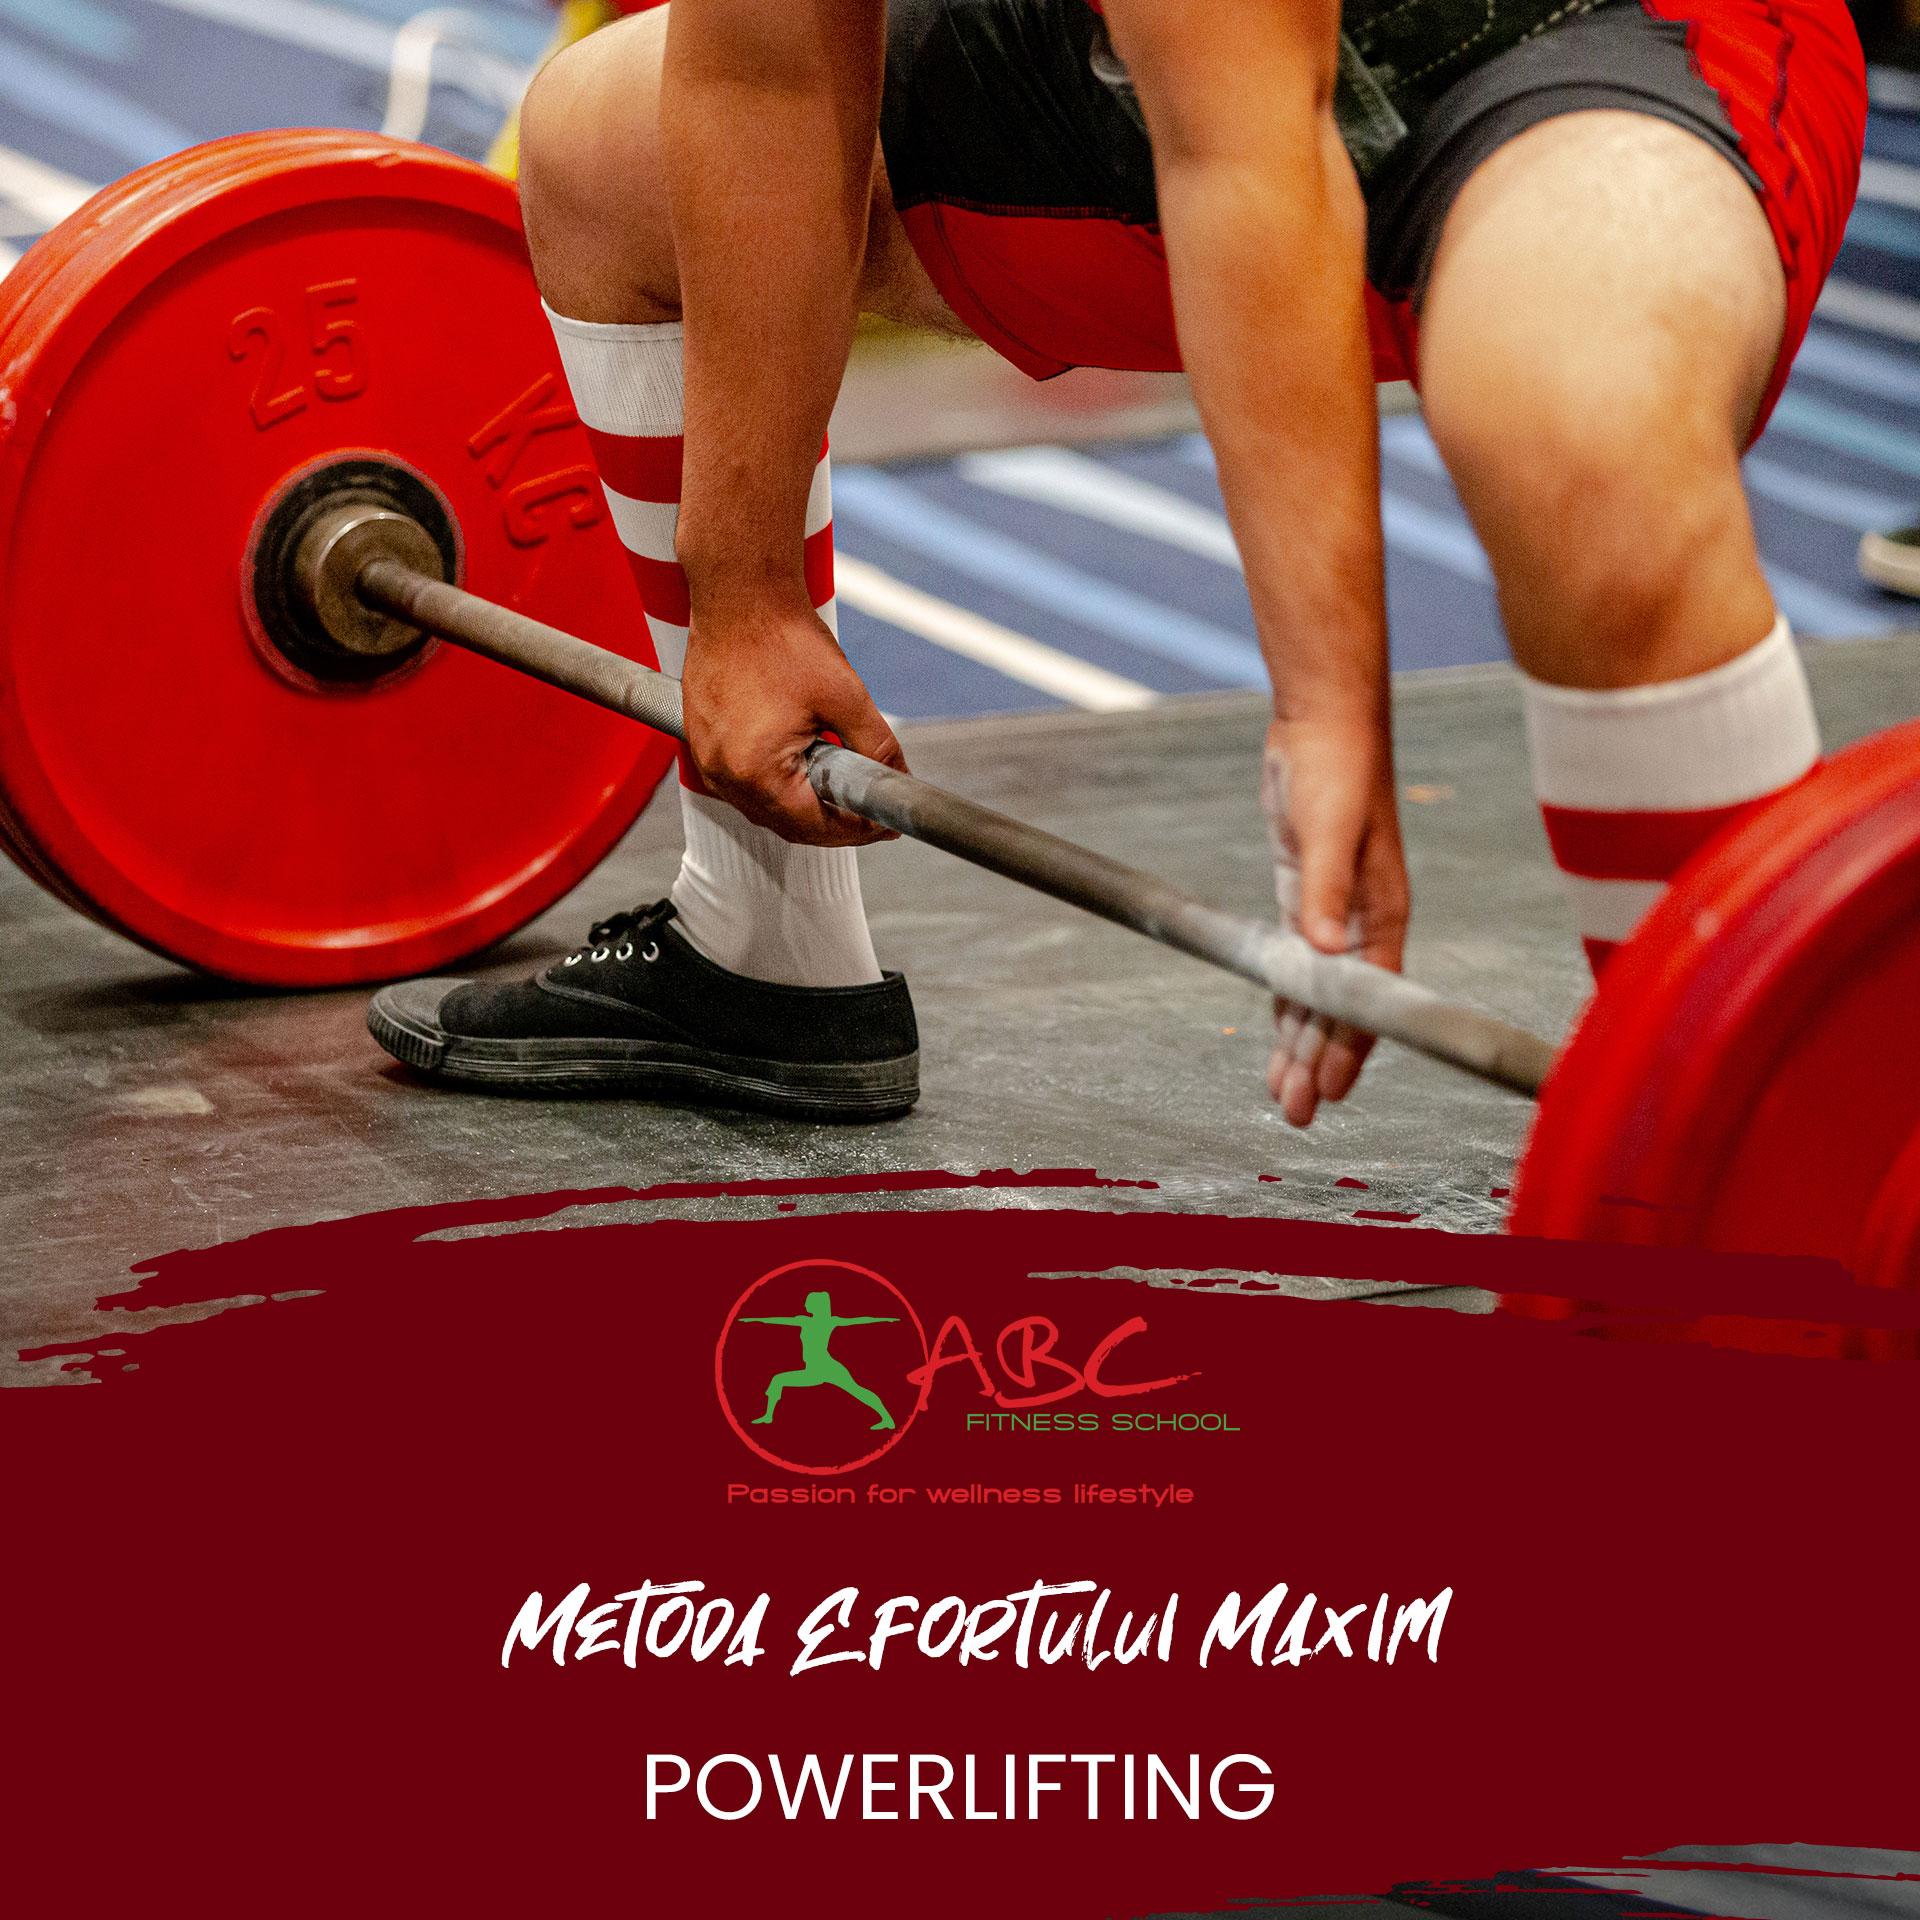 metoda efortului maxim - powerlifting